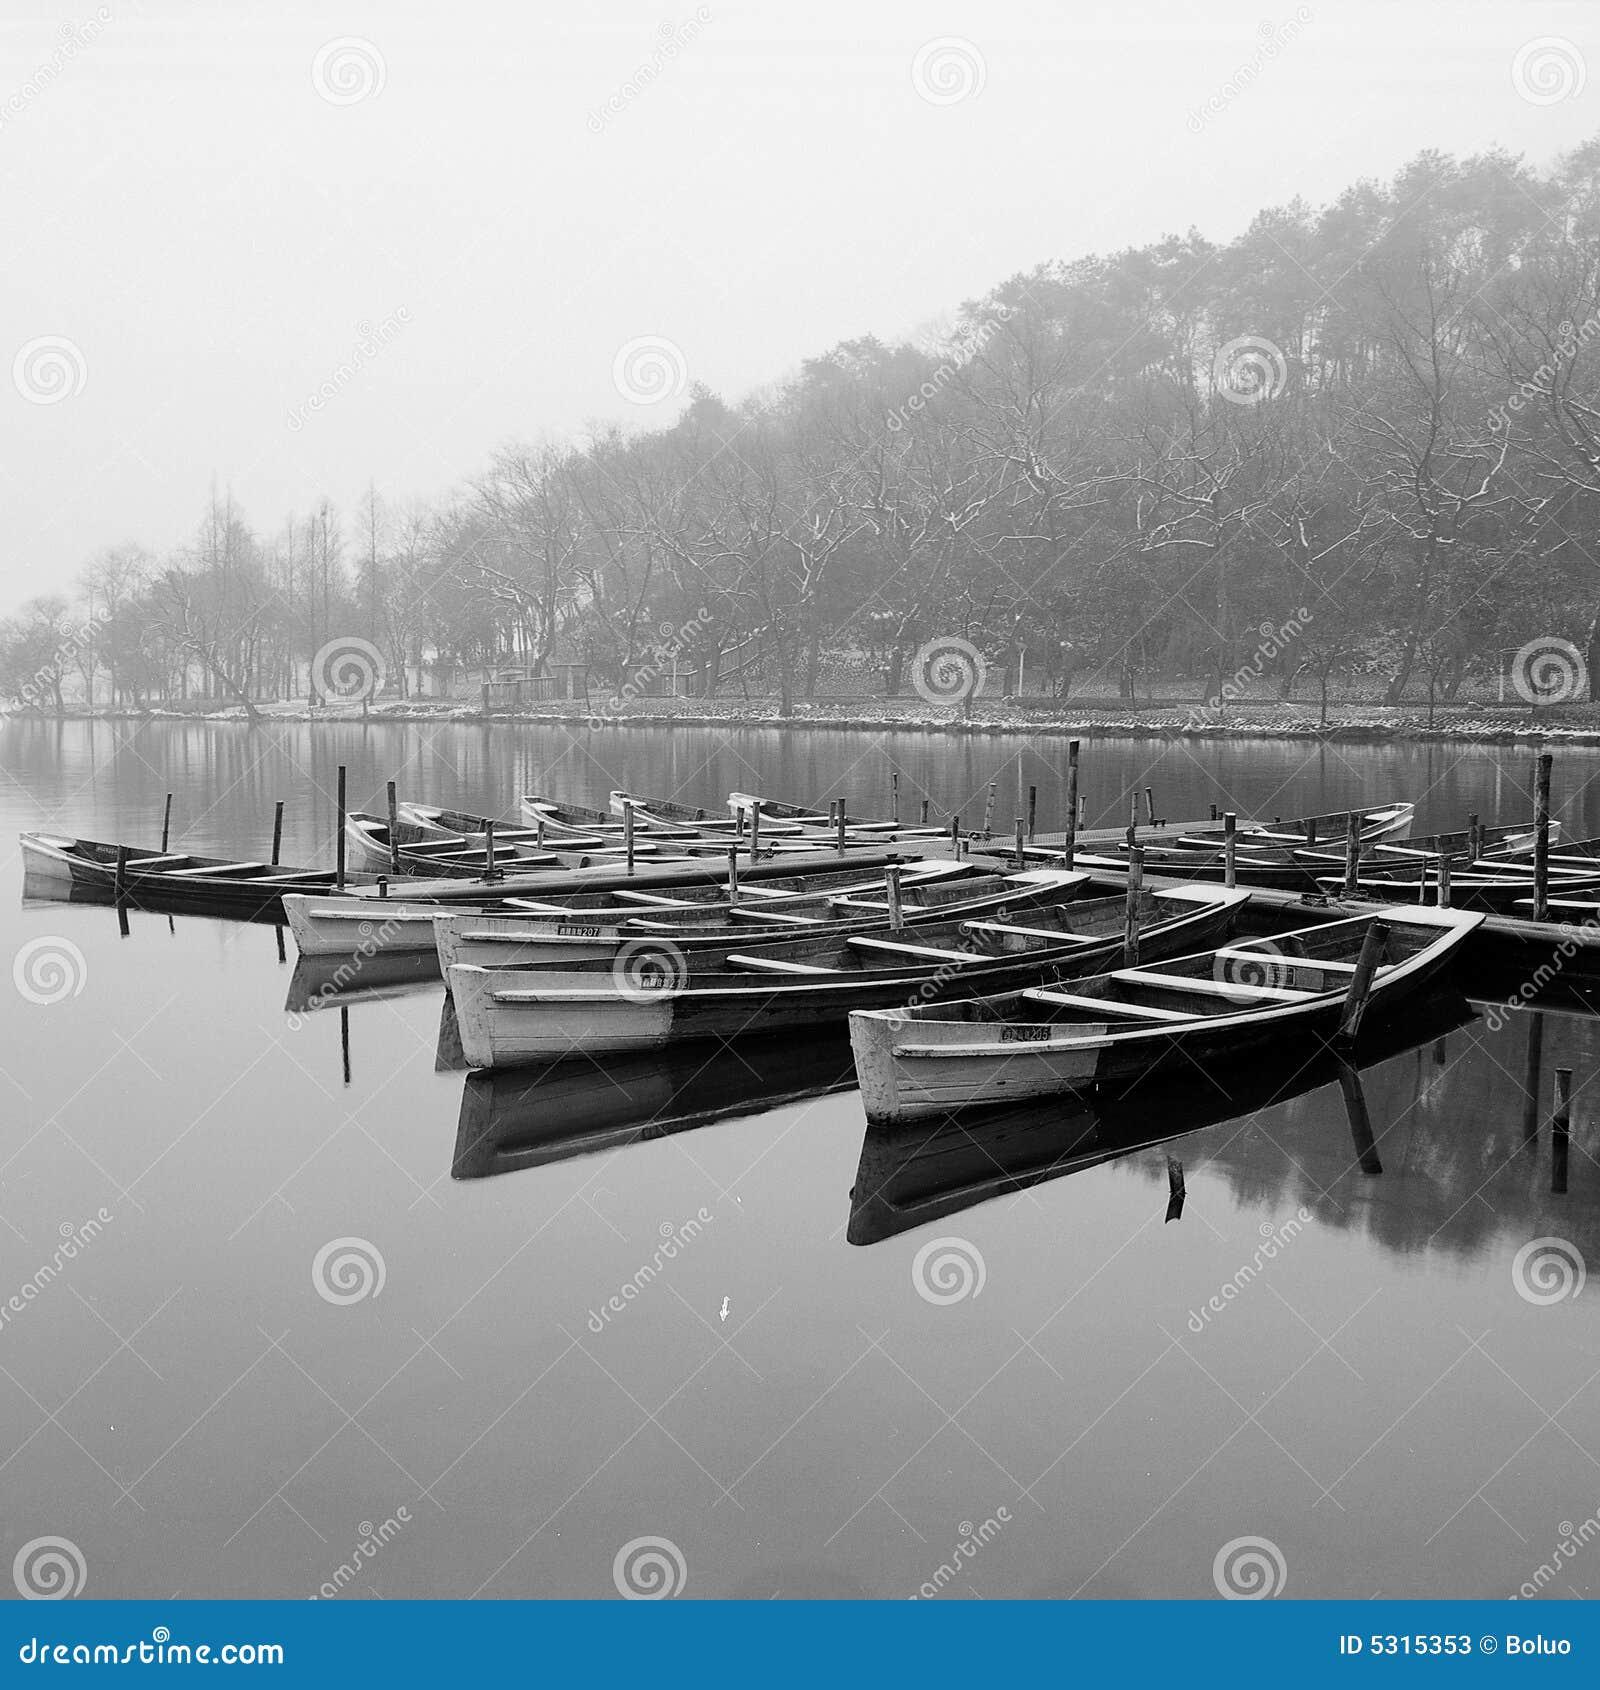 Download WestLake immagine stock. Immagine di bianco, china, barca - 5315353